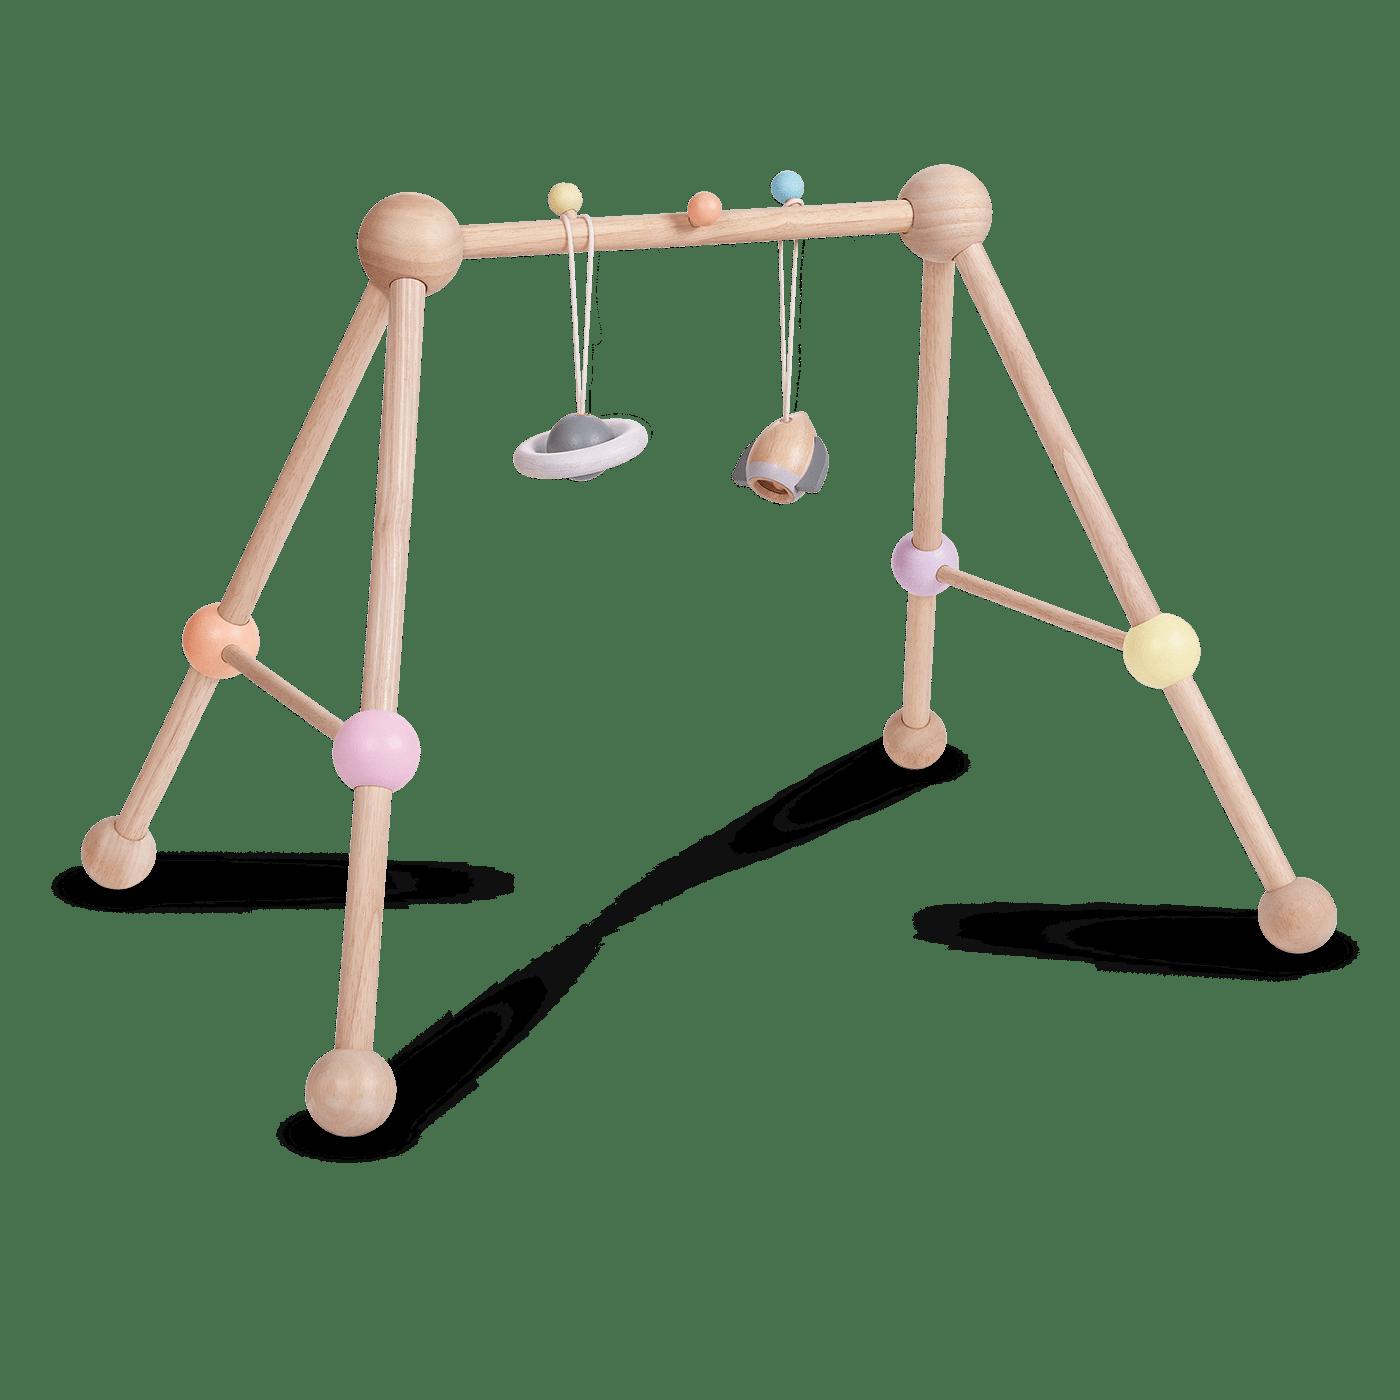 Plan Toys Play Gym